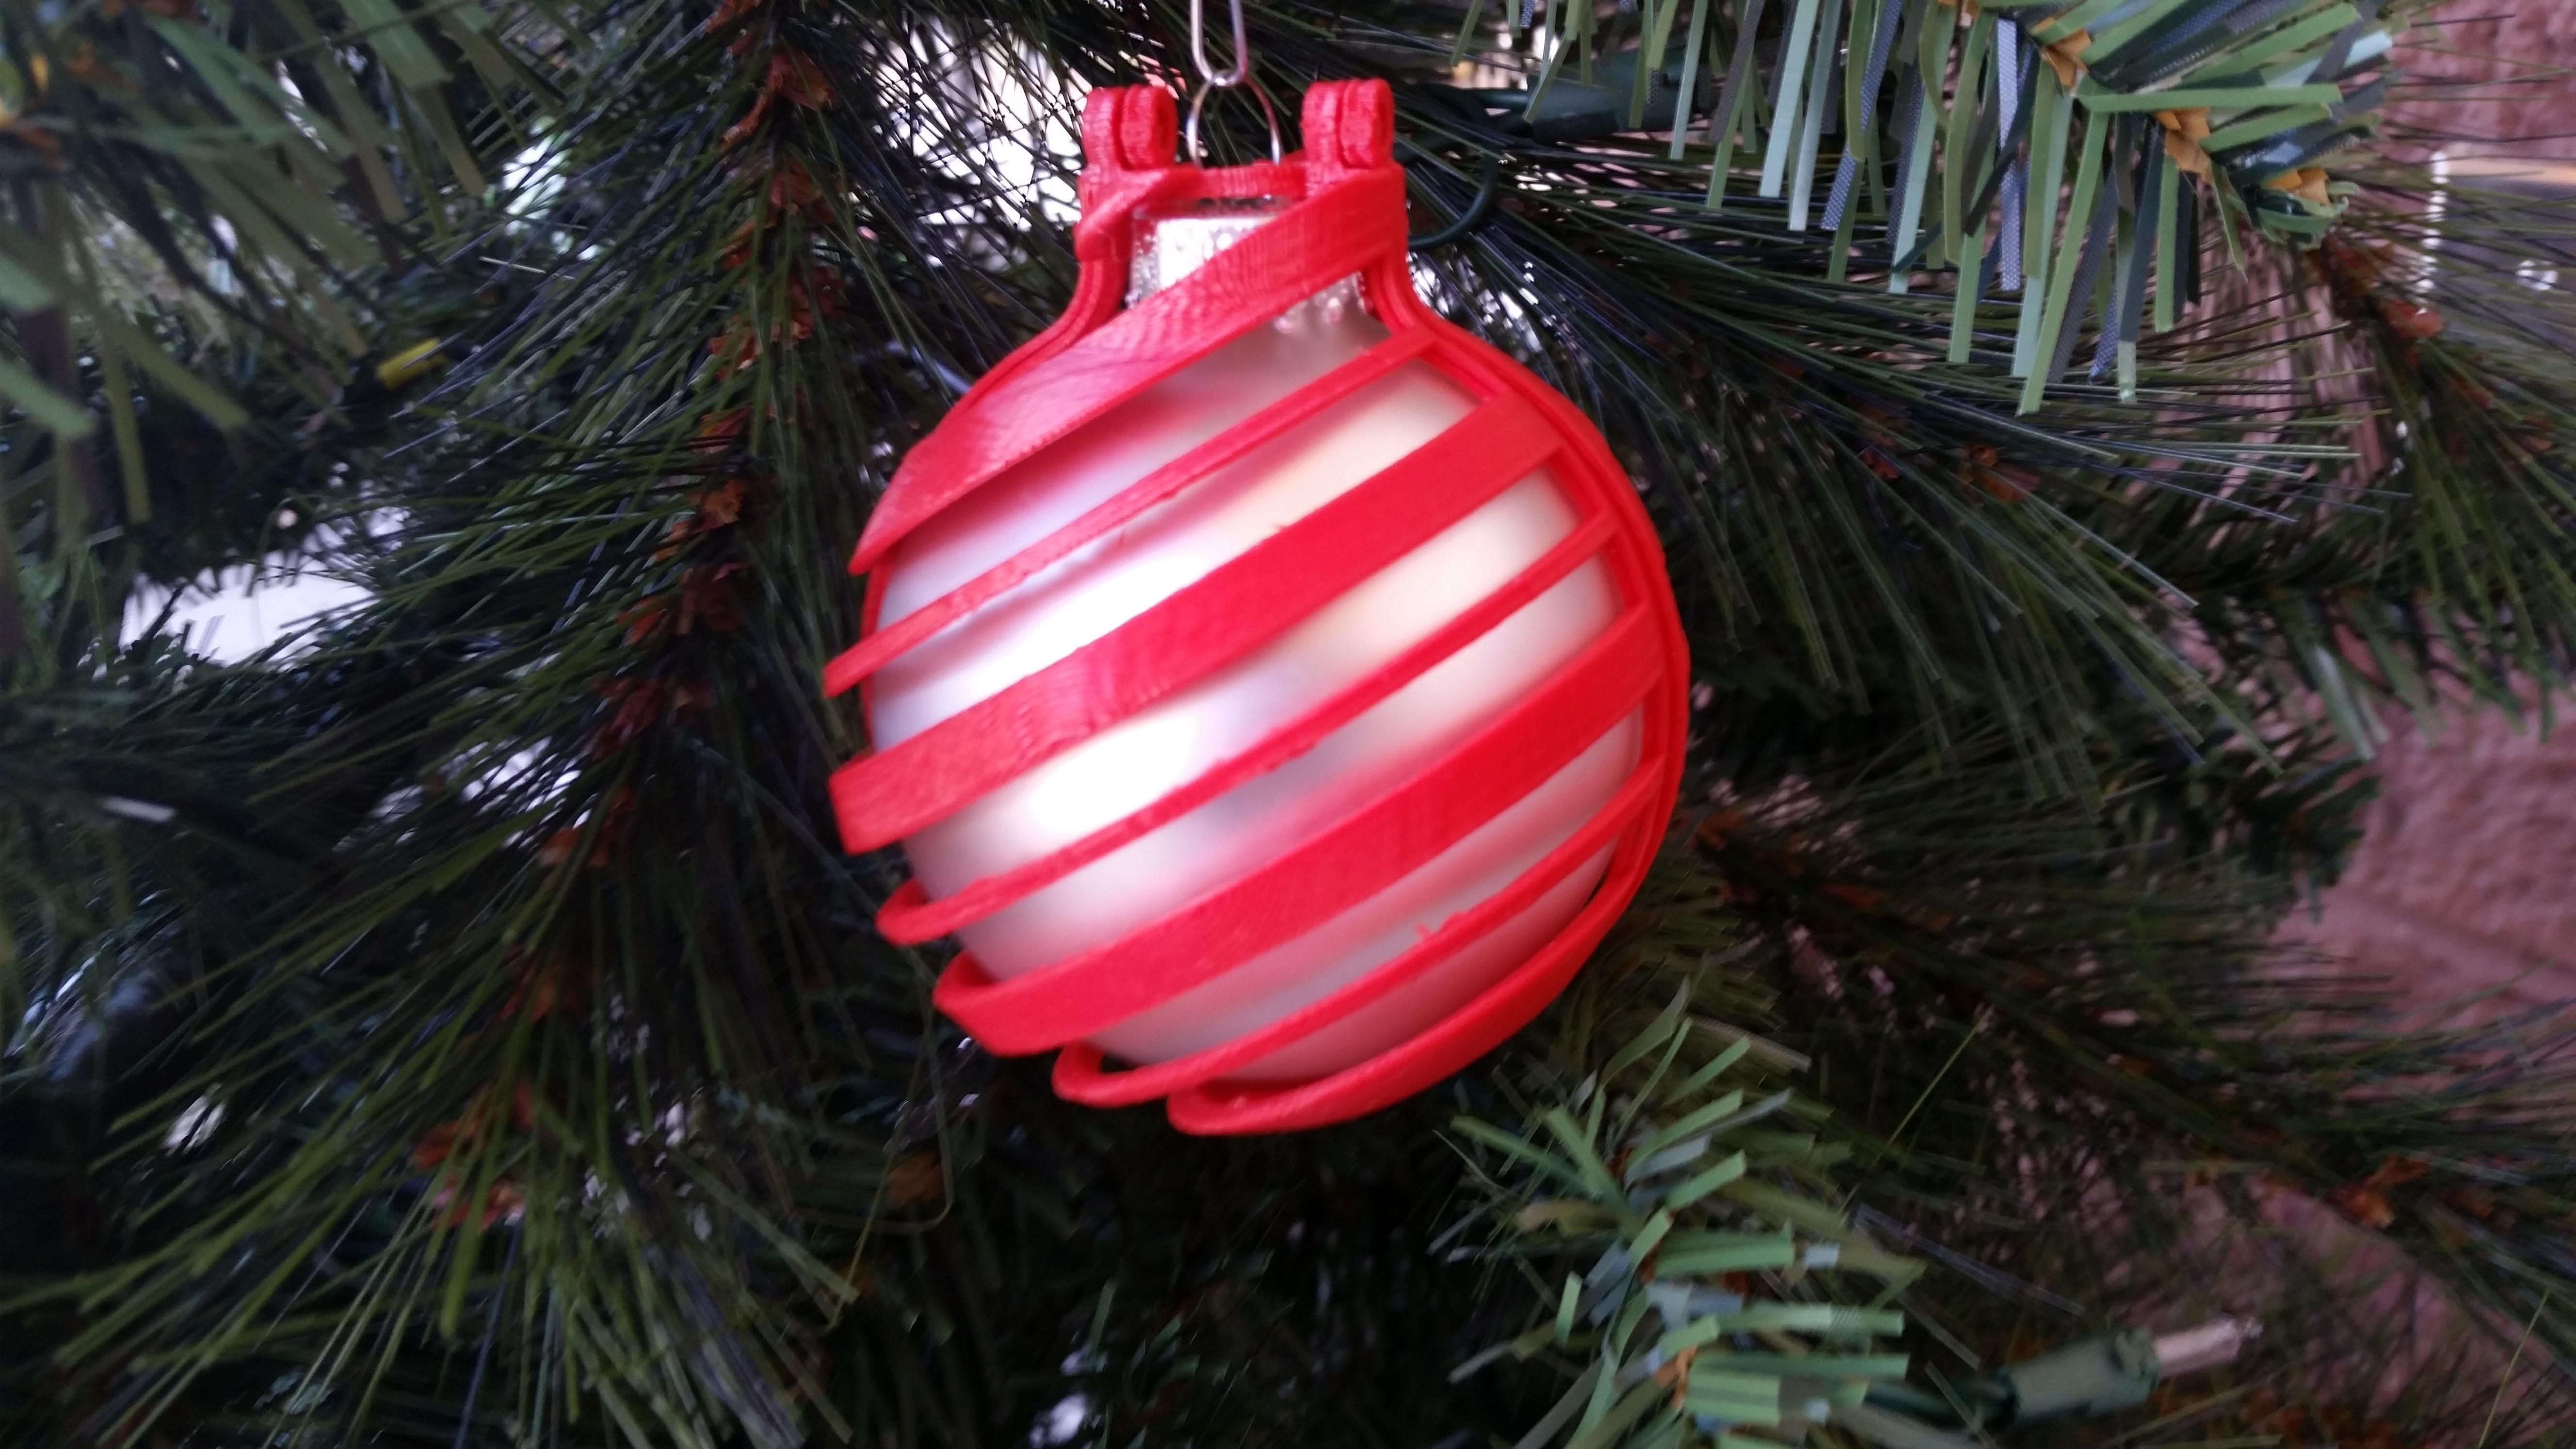 20141107_122635.jpg Download free STL file Decorative Ornament Cage • 3D printable object, Porda